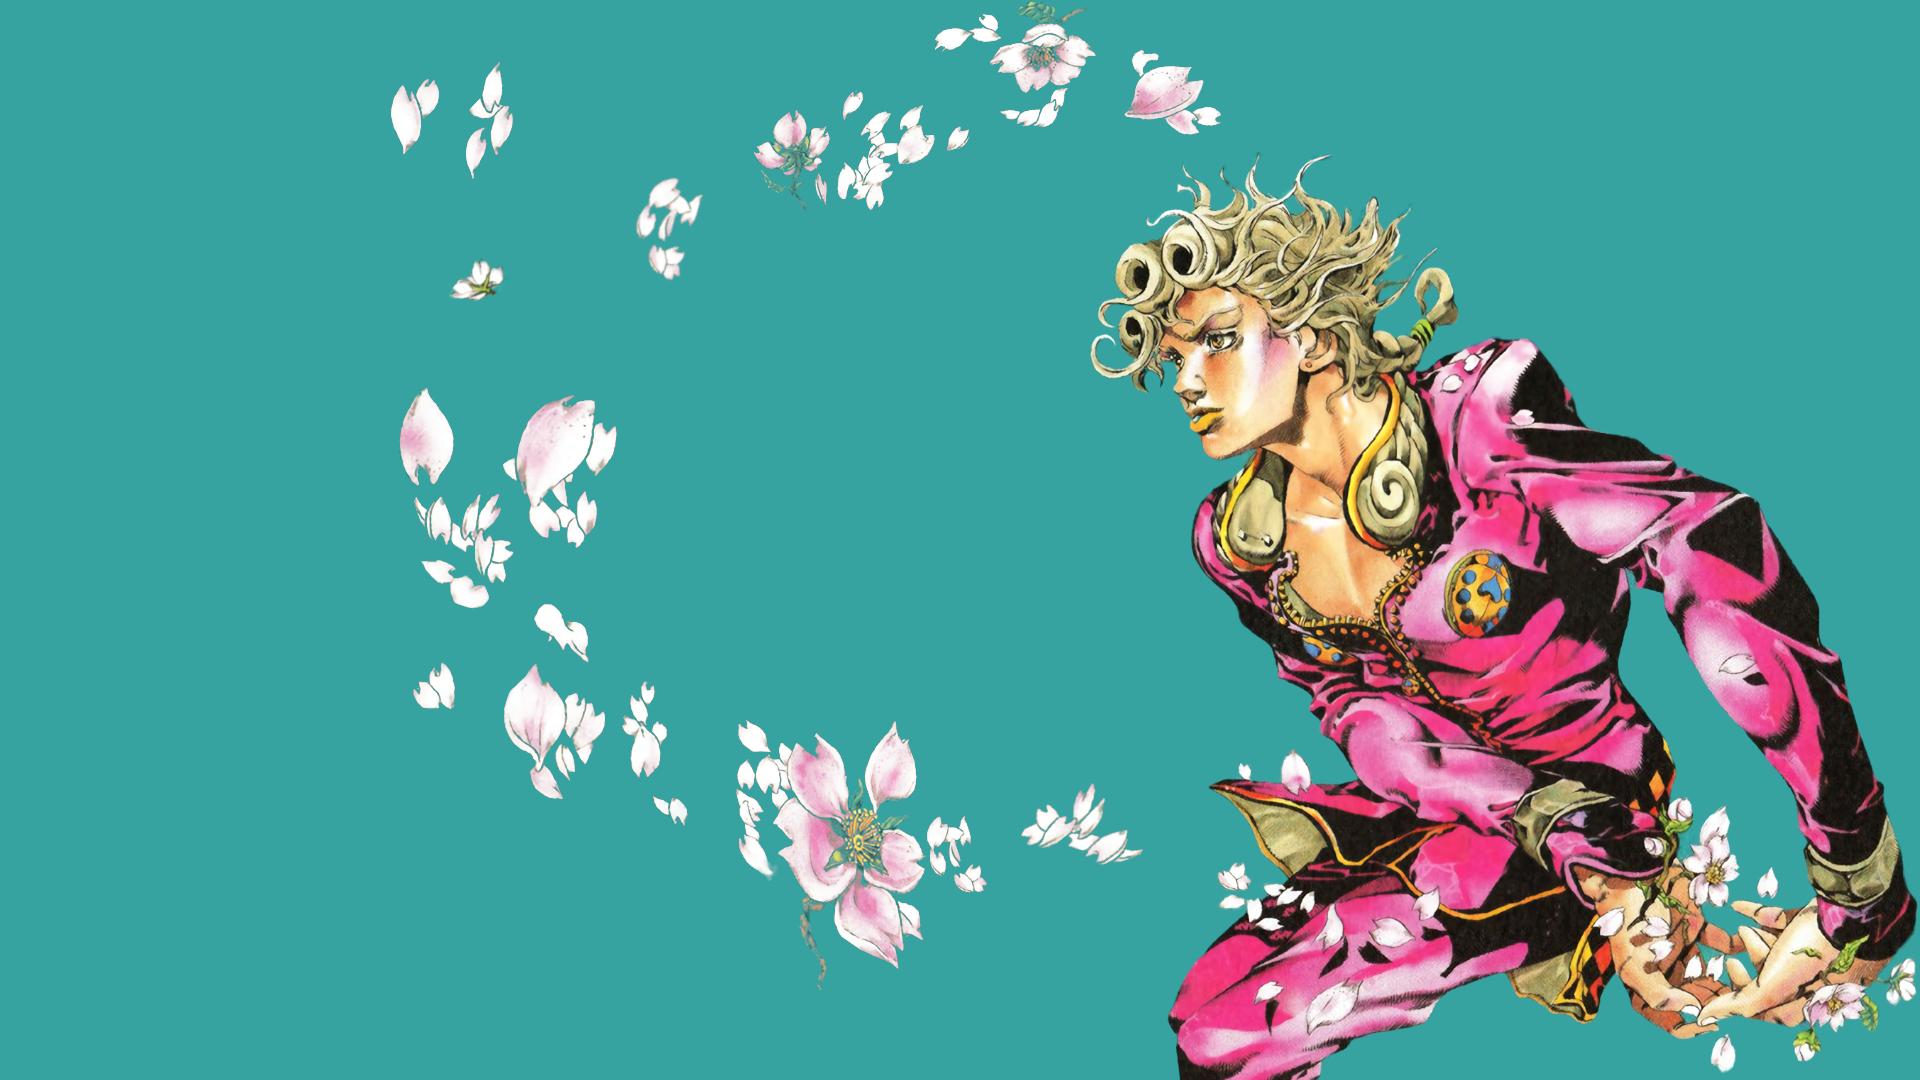 Wallpaper Jojo S Bizarre Adventure Giorno Giovanna Minimalism Manga 1920x1080 Mc024 1936697 Hd Wallpapers Wallhere